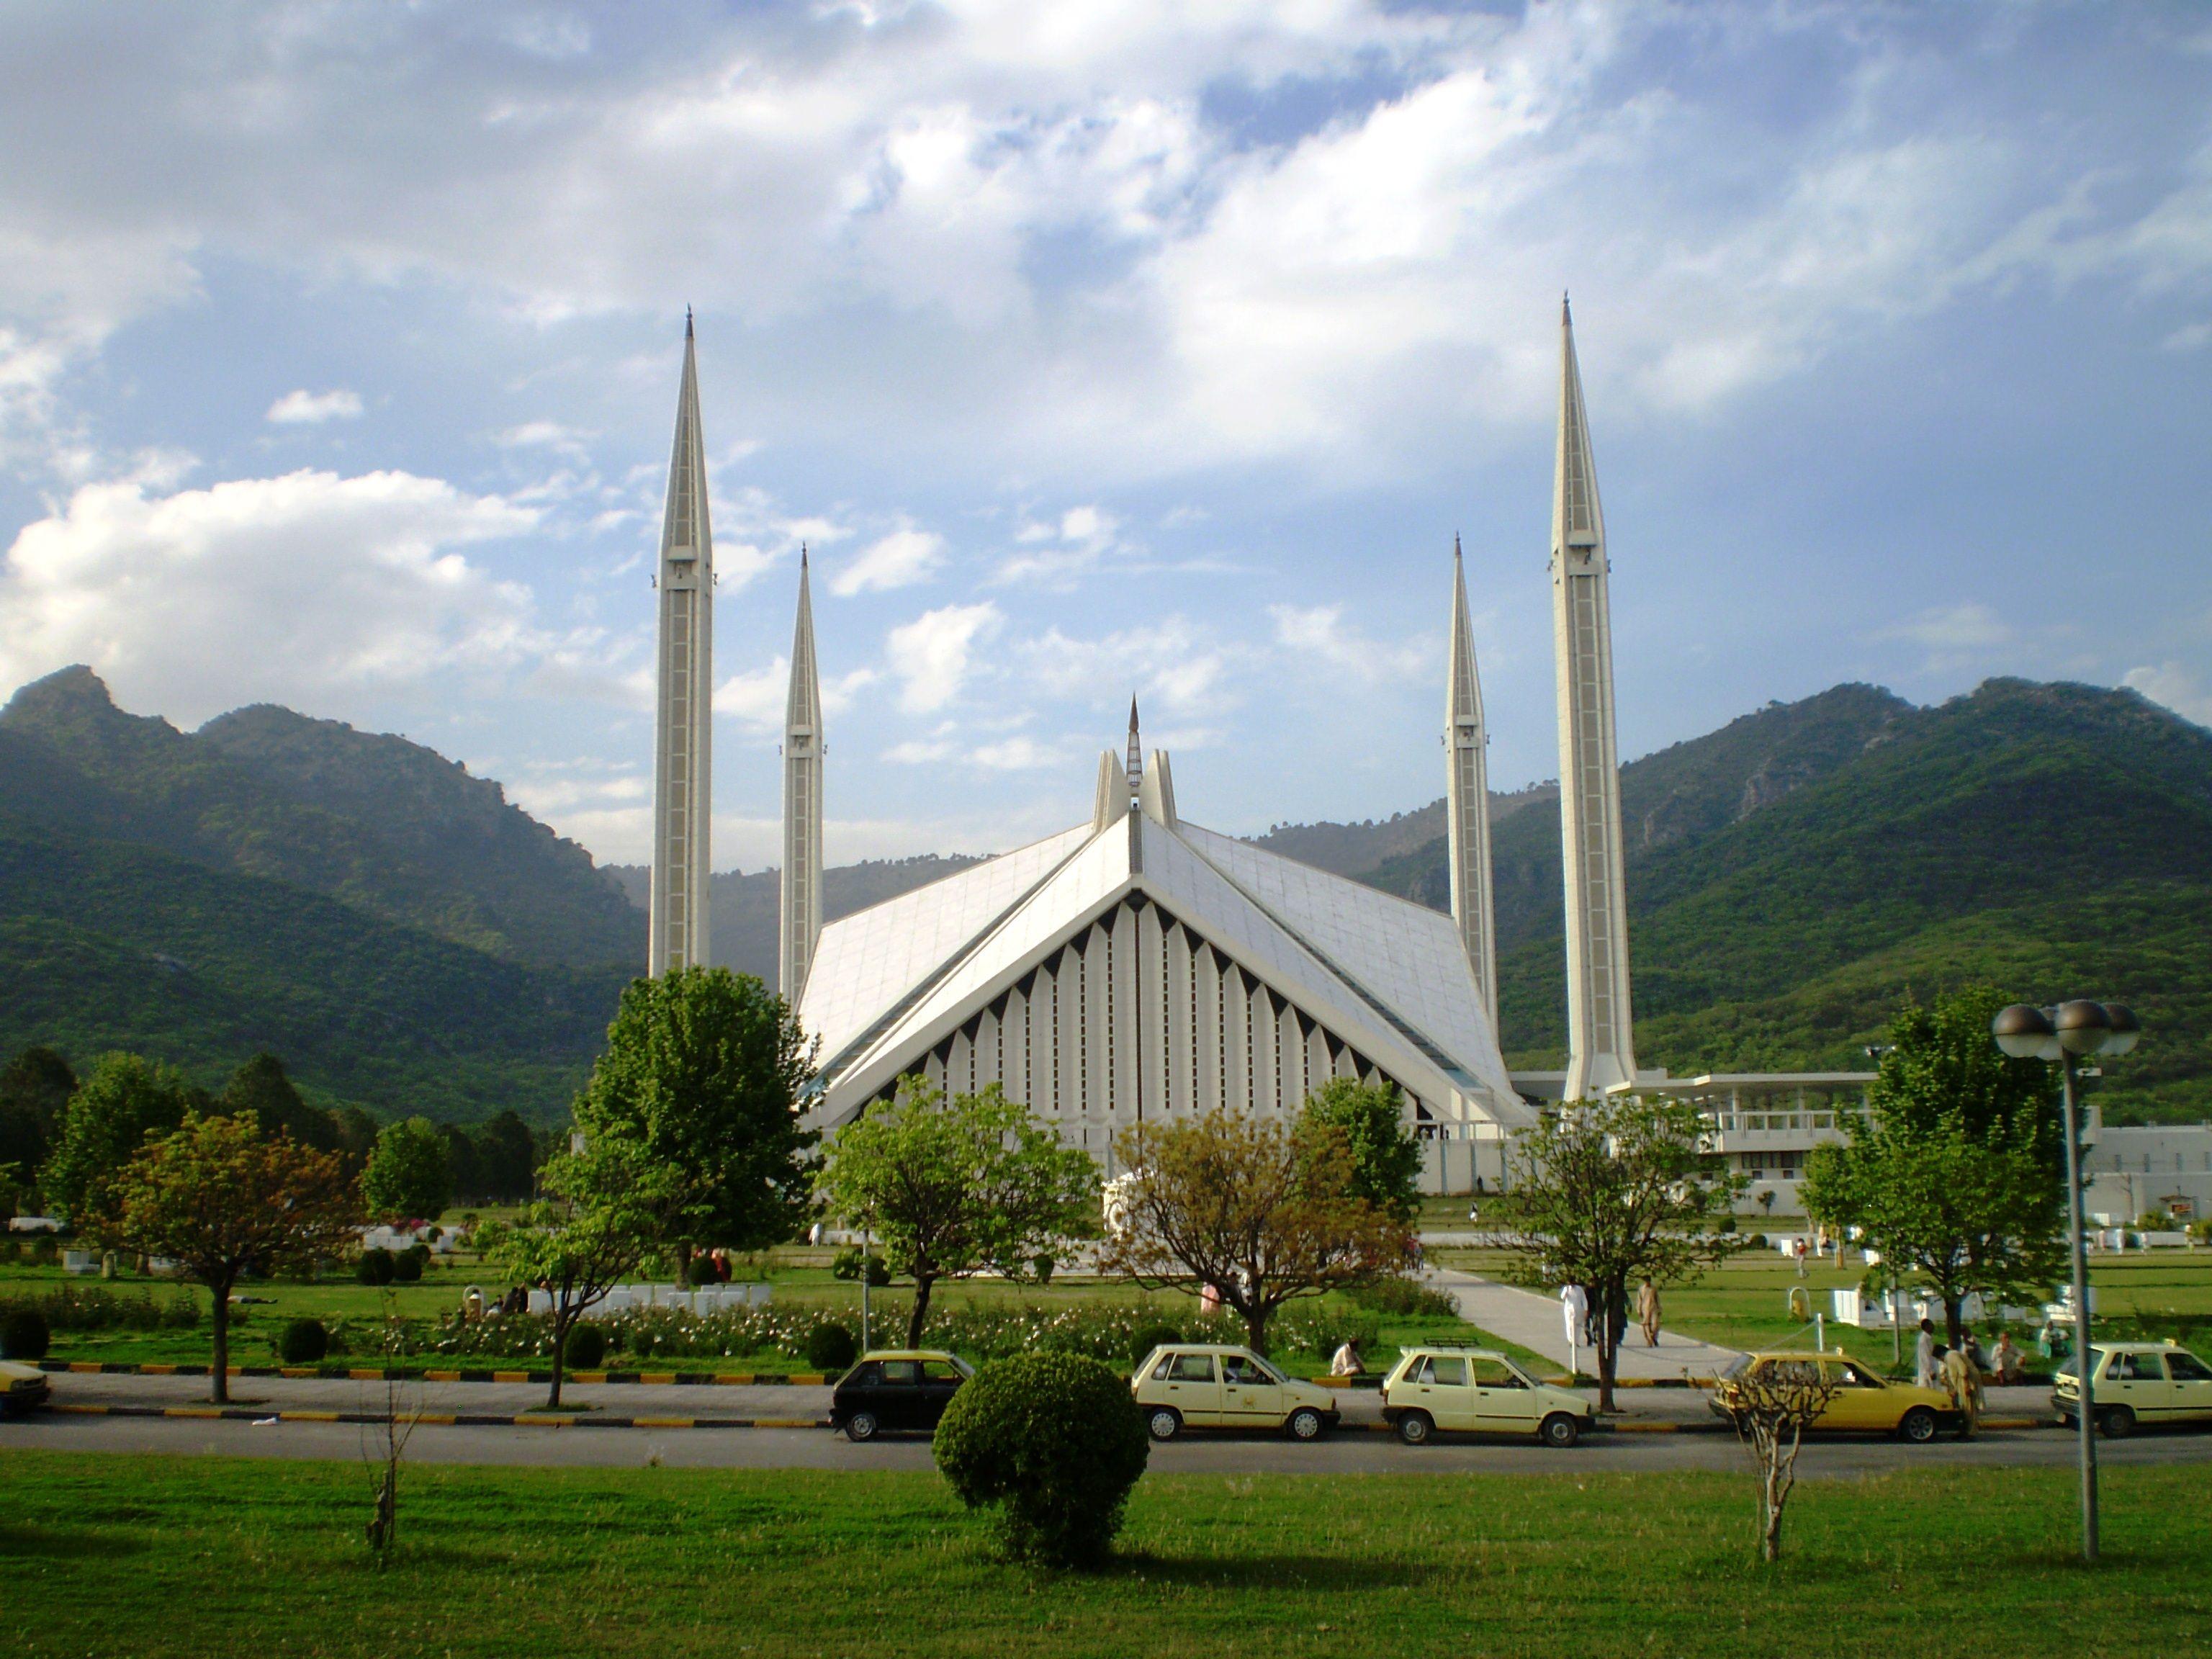 Faisal Masjid Islamabad Pakistan Dream Destinations